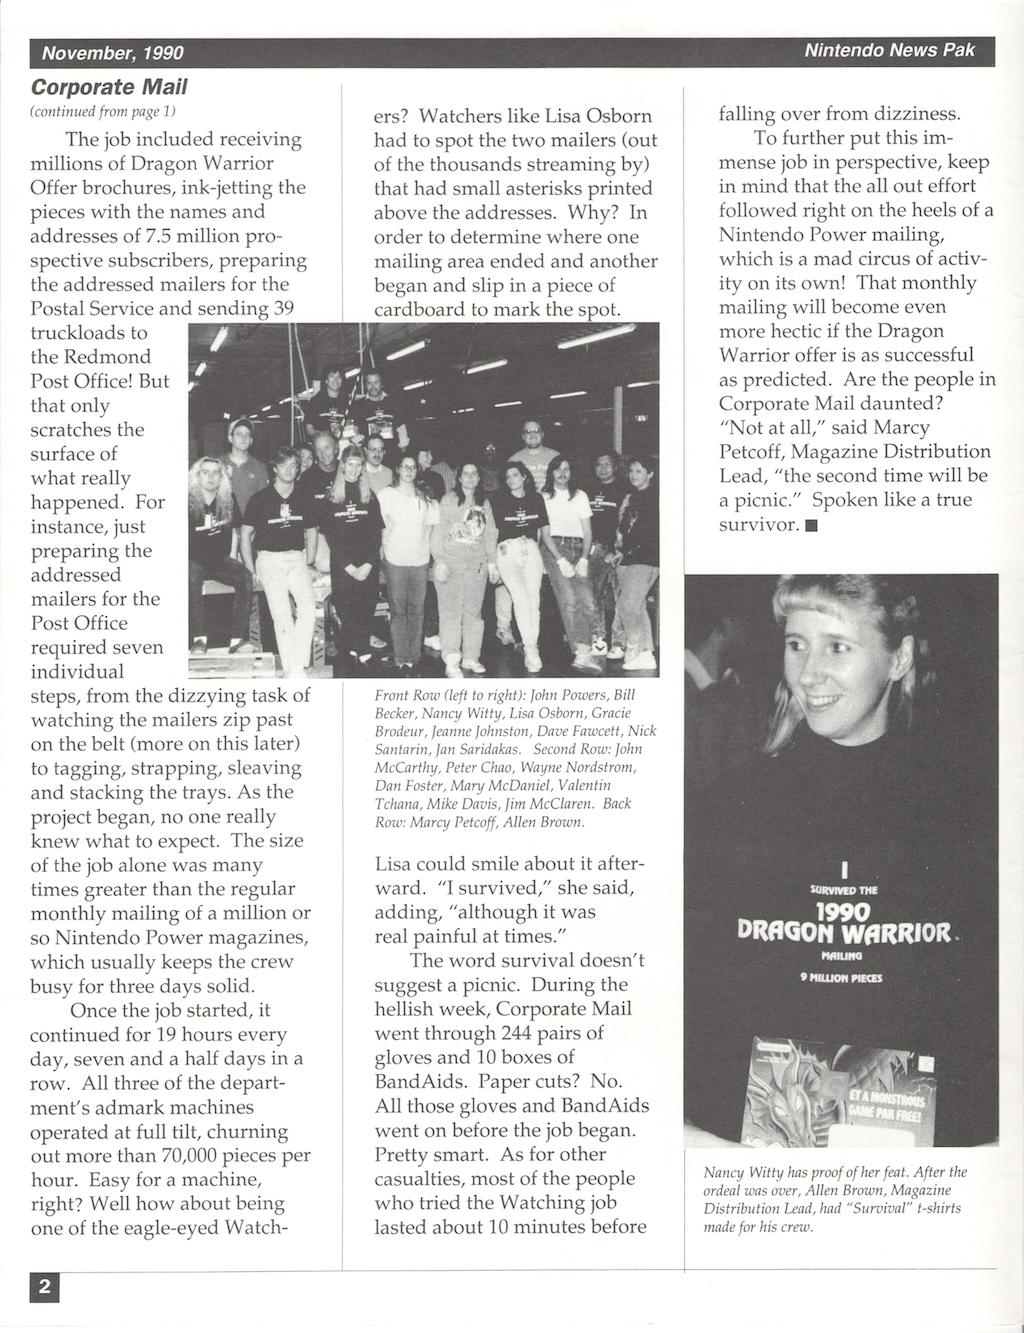 Nintendo-News-Pak | November 1990 p2 | Credit Steven Lin